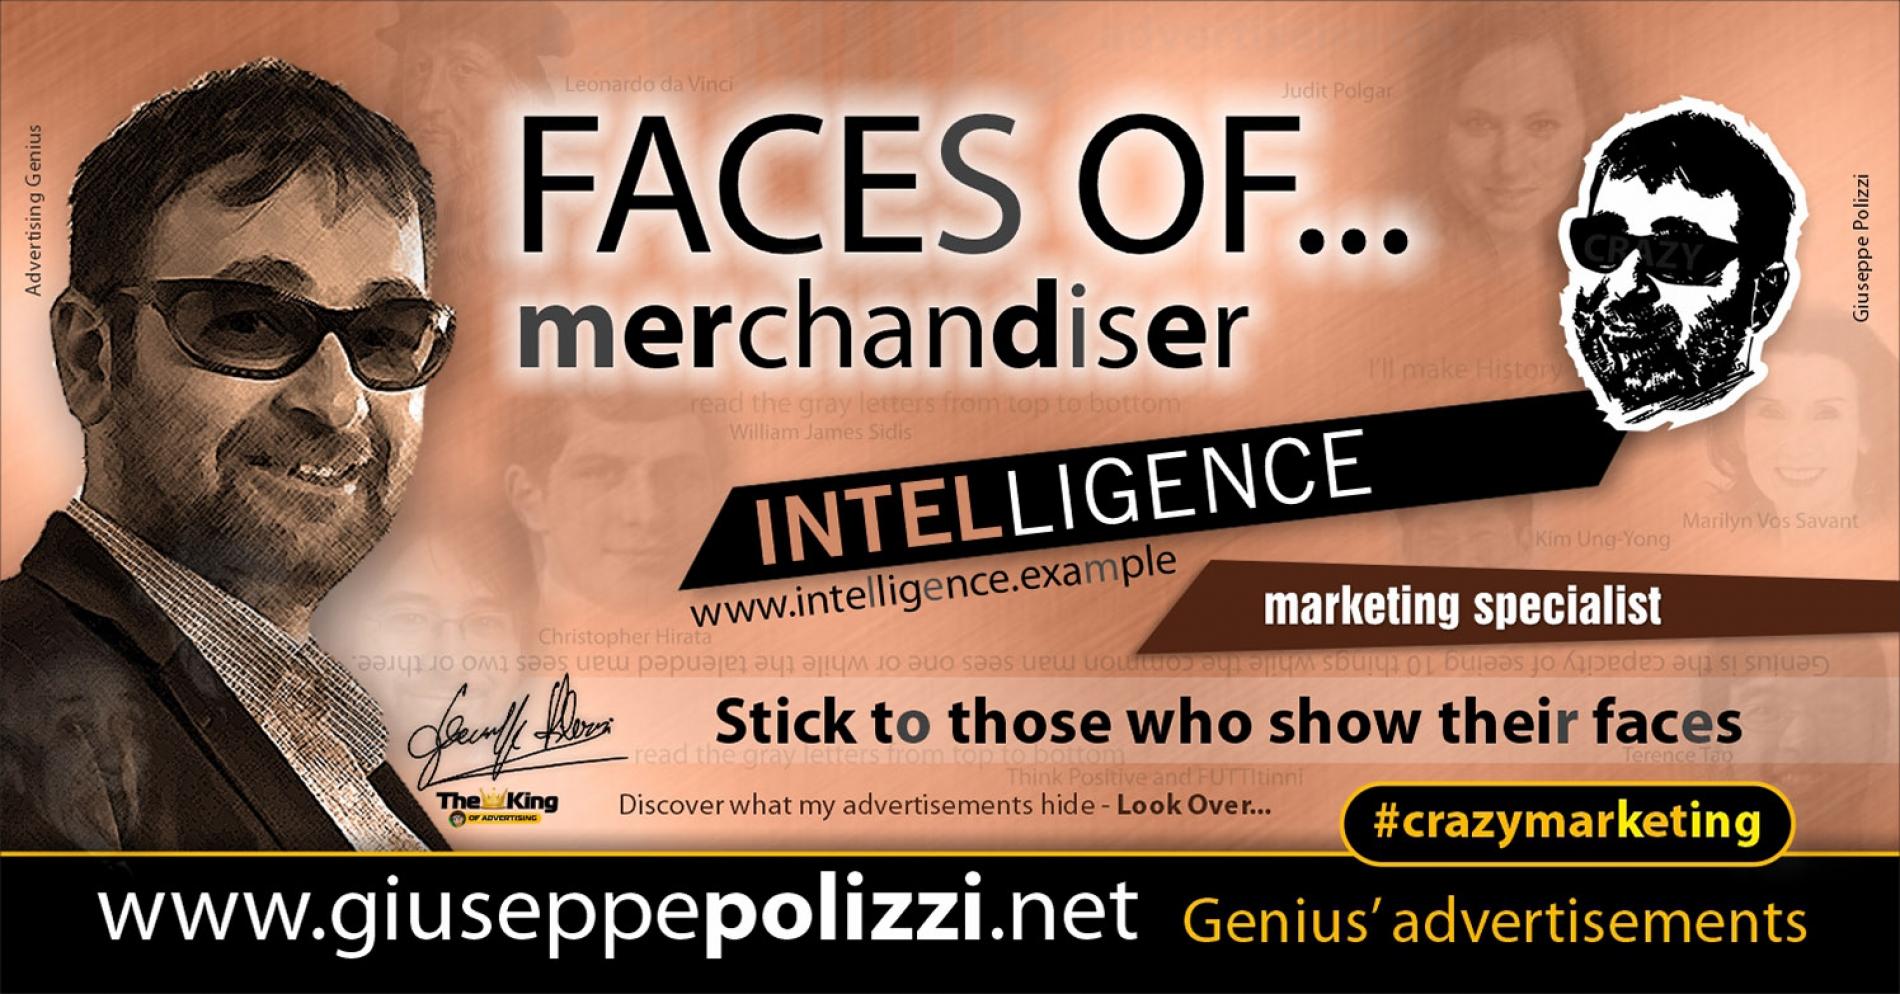 Giuseppe Polizzi Crazymarketing Faces od Merchaindiser advertisements eng